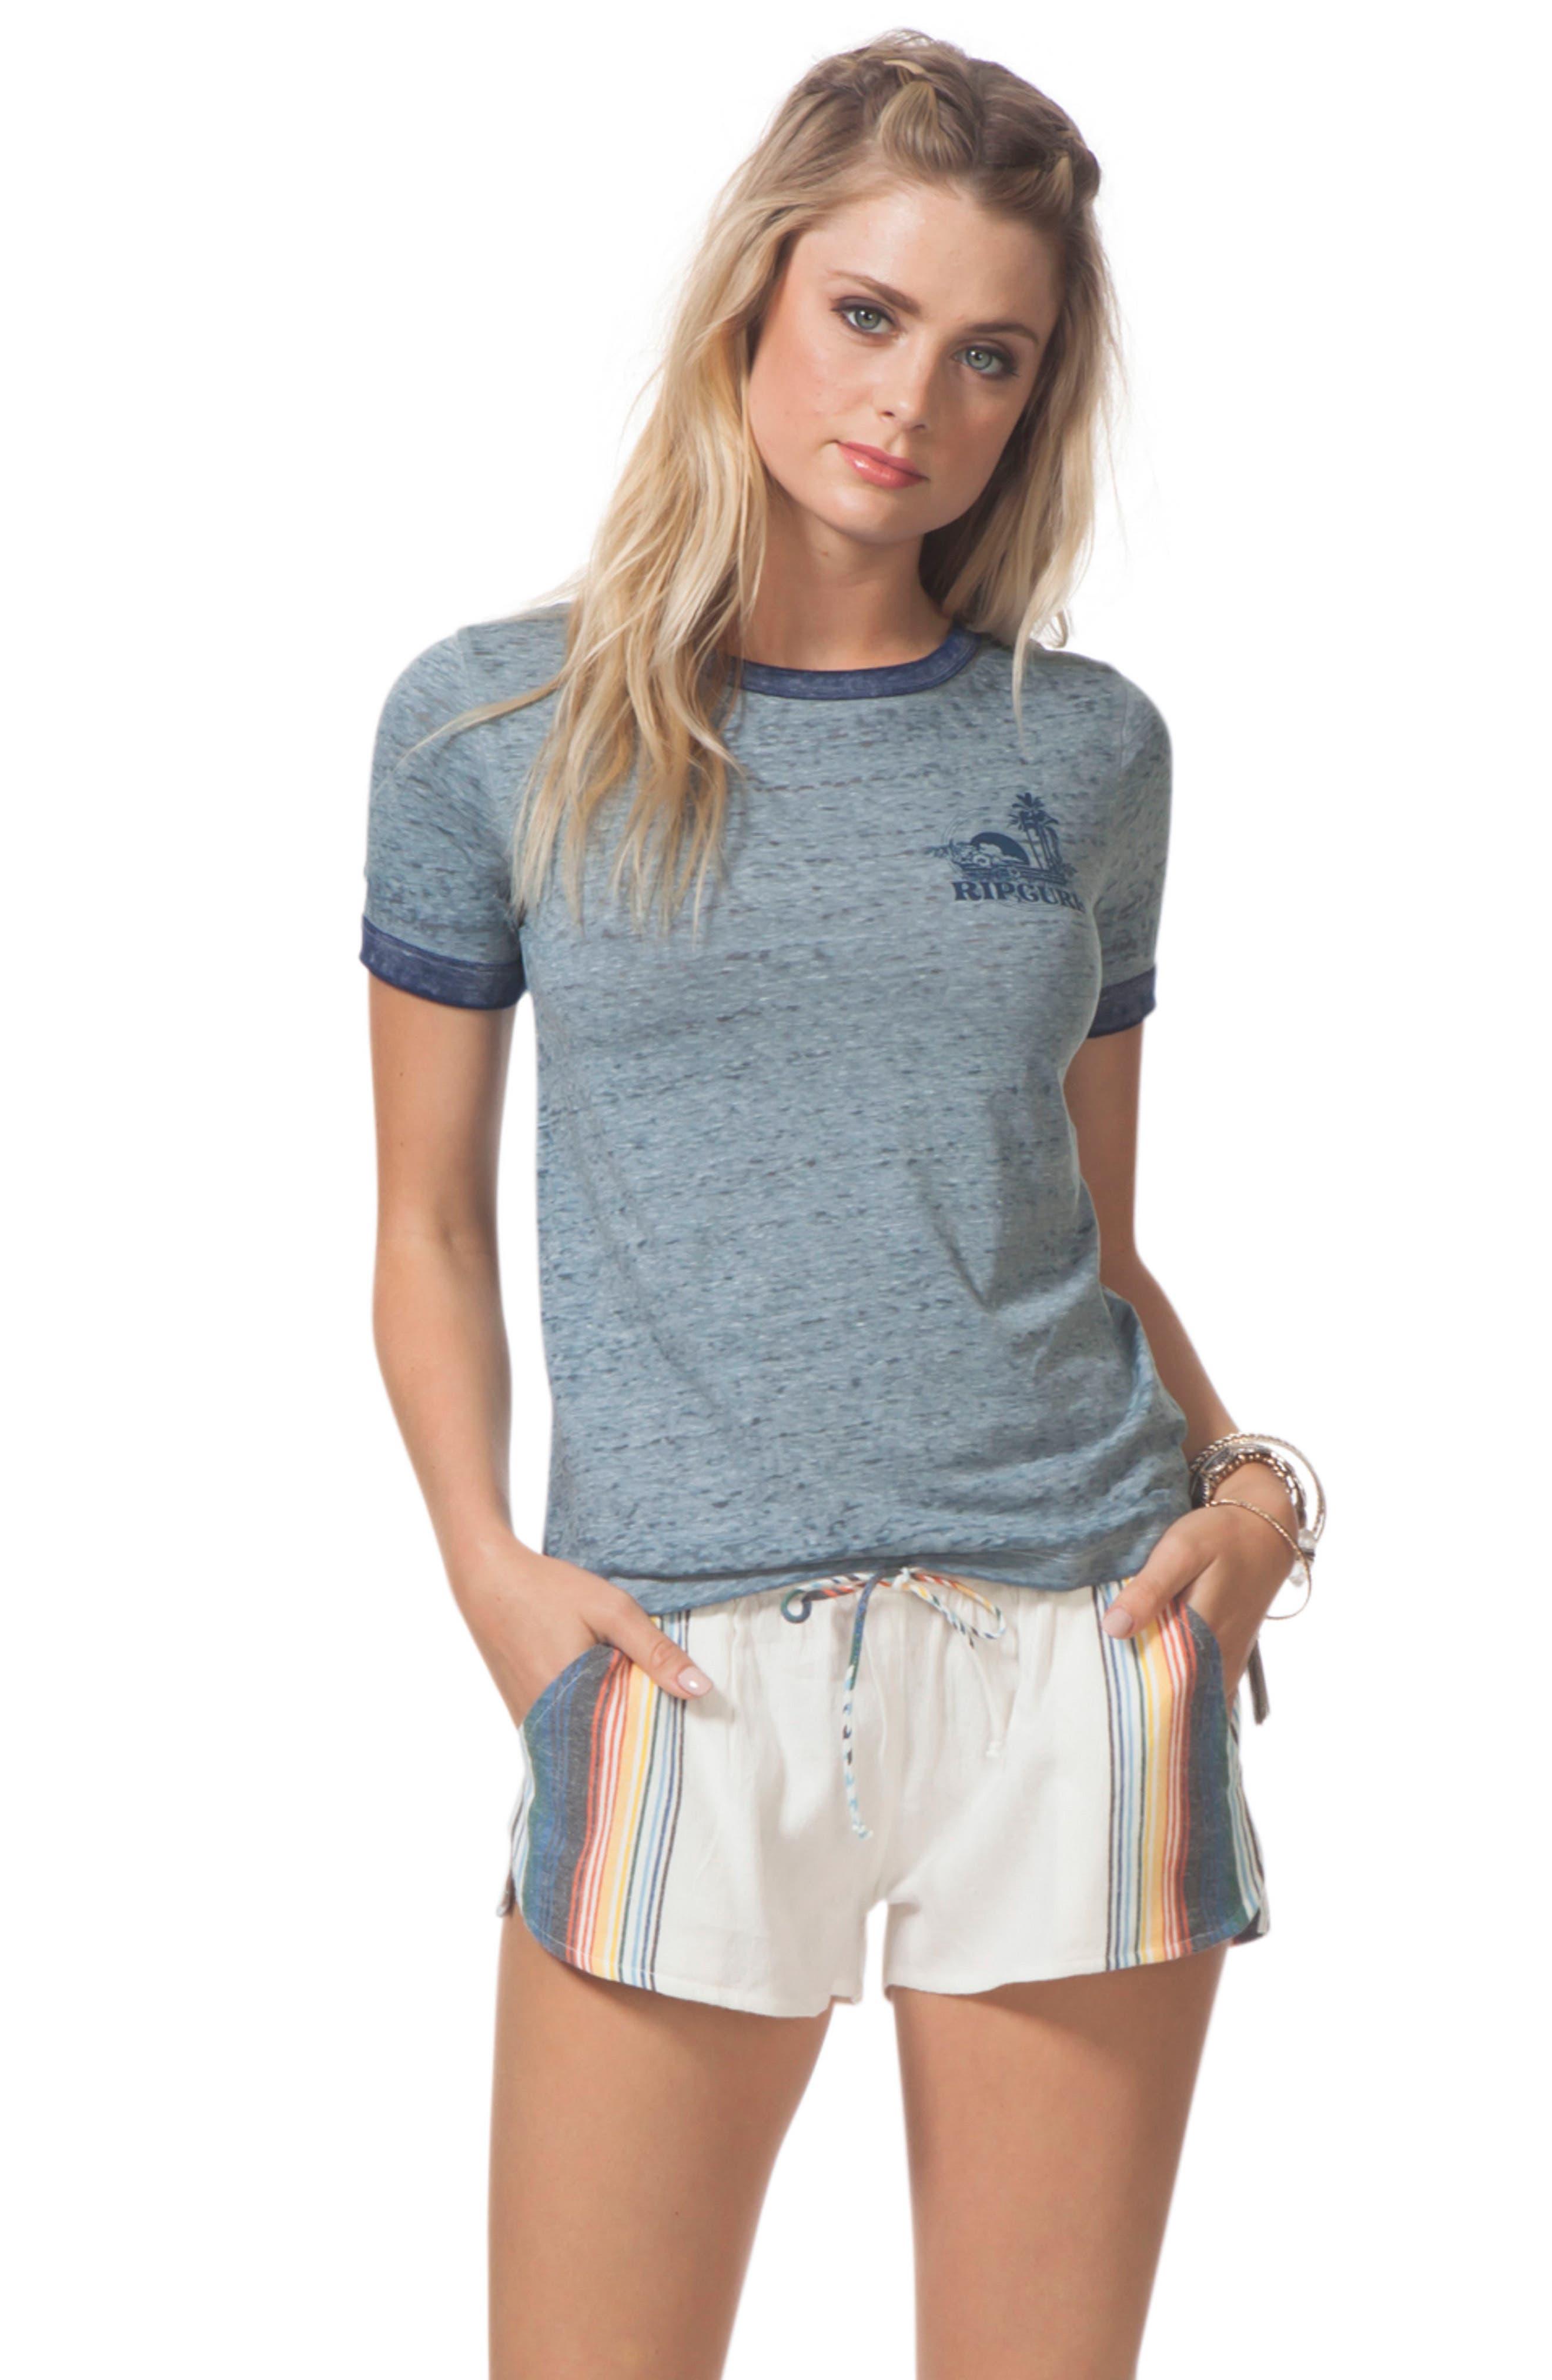 Beach Bazaar Cotton Shorts,                             Alternate thumbnail 3, color,                             111